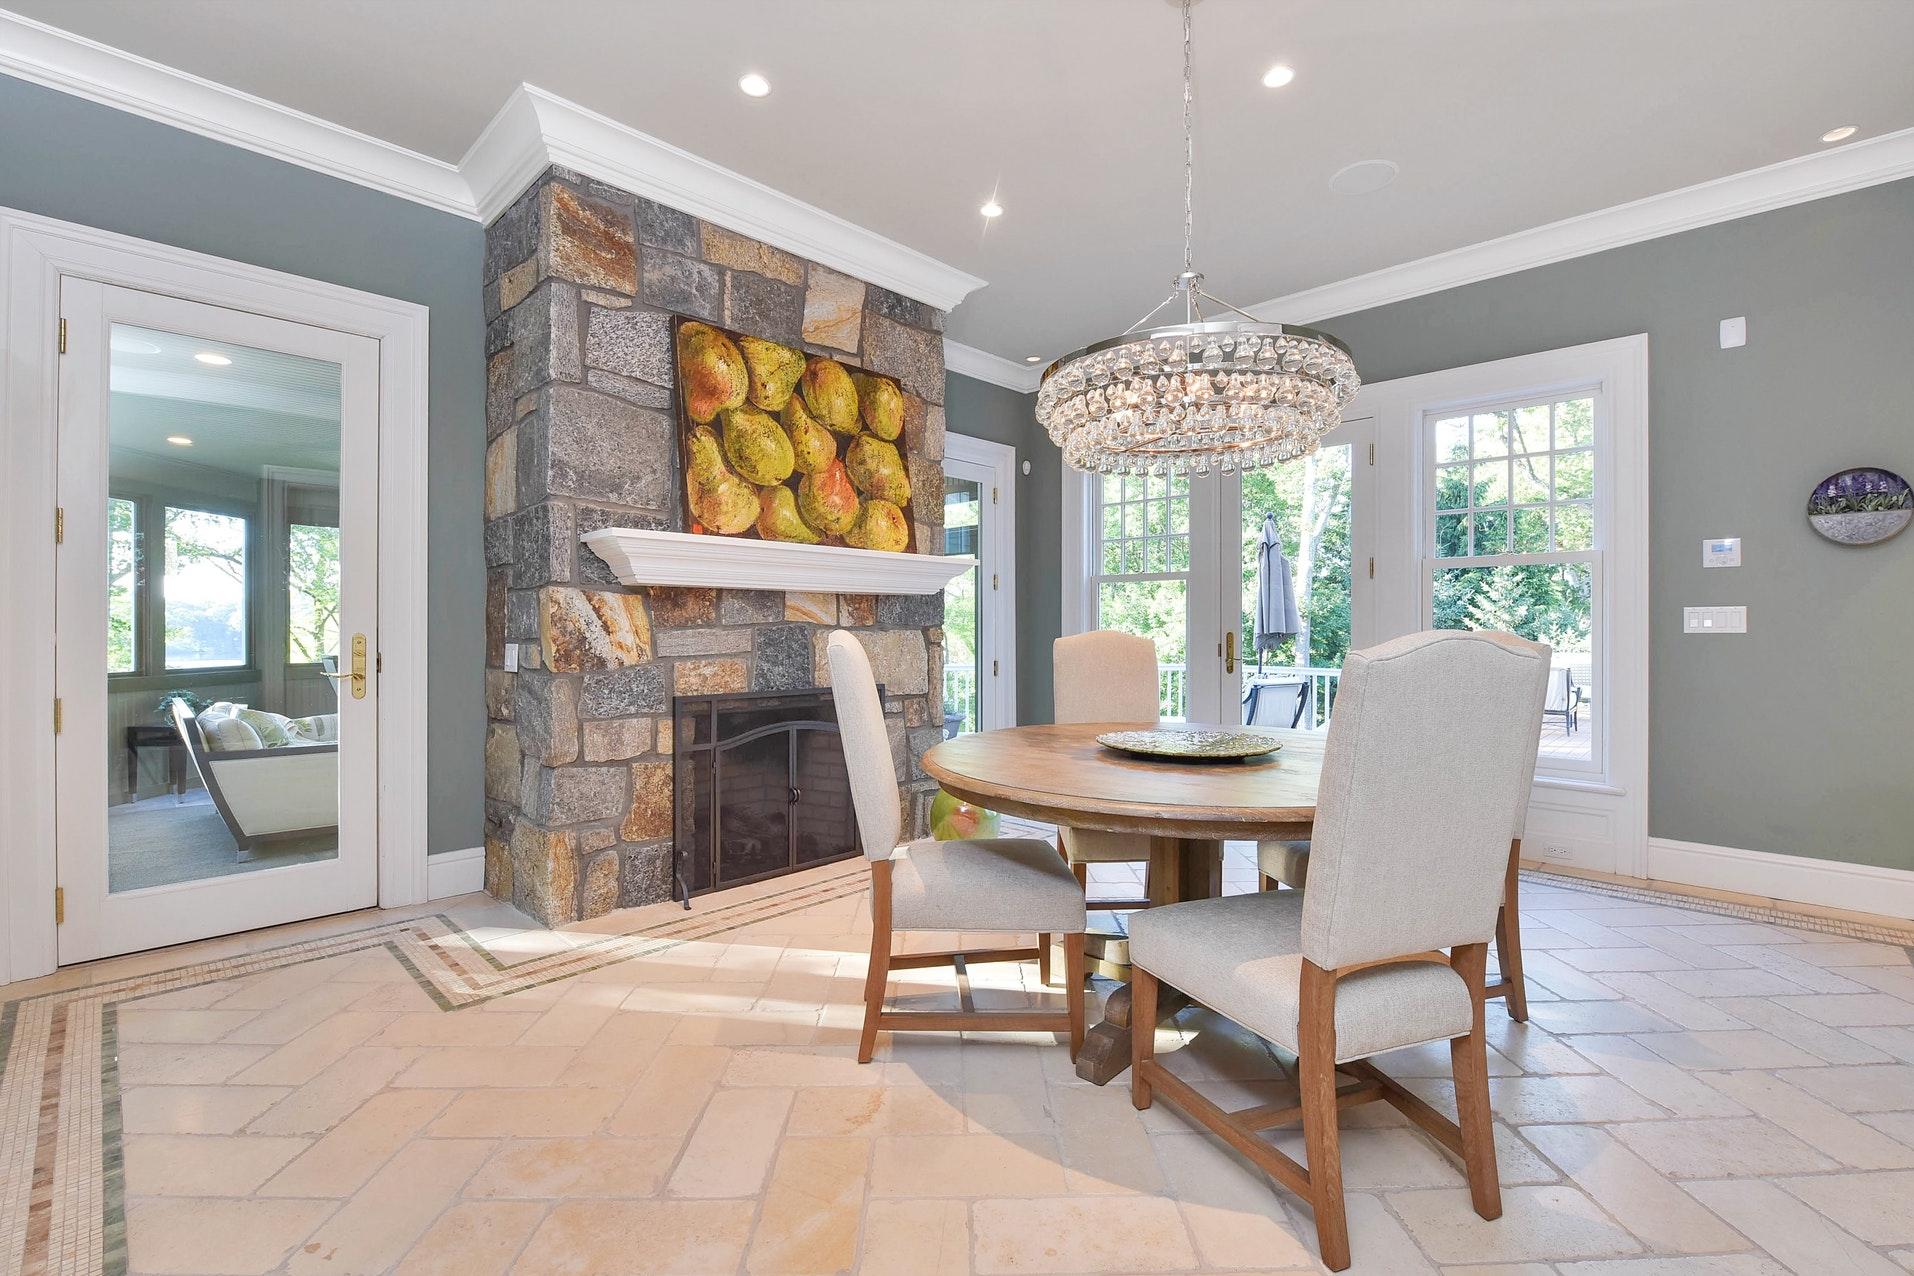 Luxury Scioto Kitchens Mold - Interior Design Ideas & Home ...